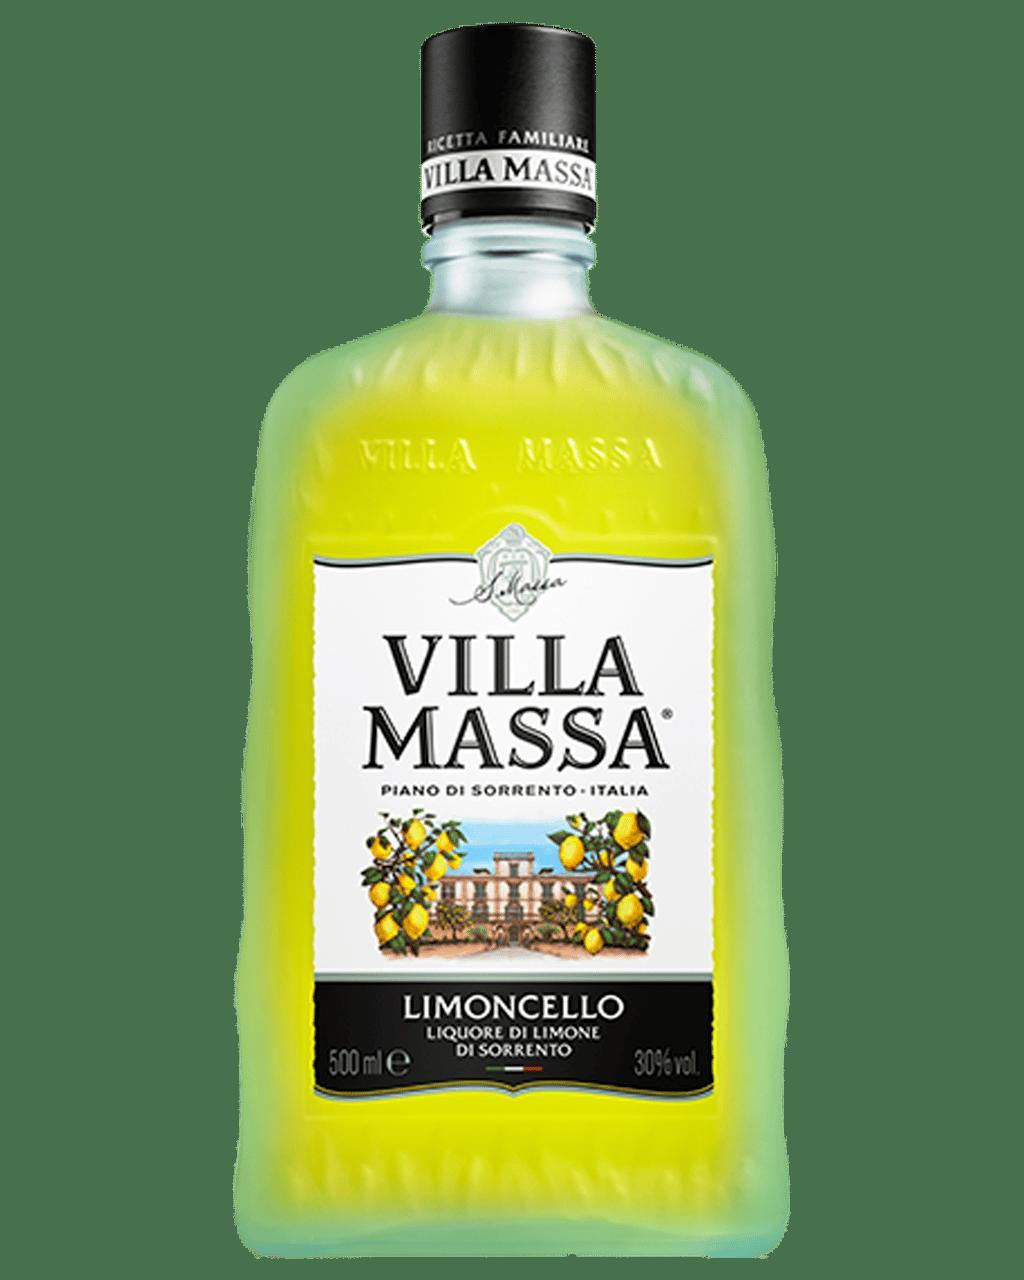 537ee19b44c Villa Massa Limoncello 500mL | Dan Murphy's | Buy Wine, Champagne ...